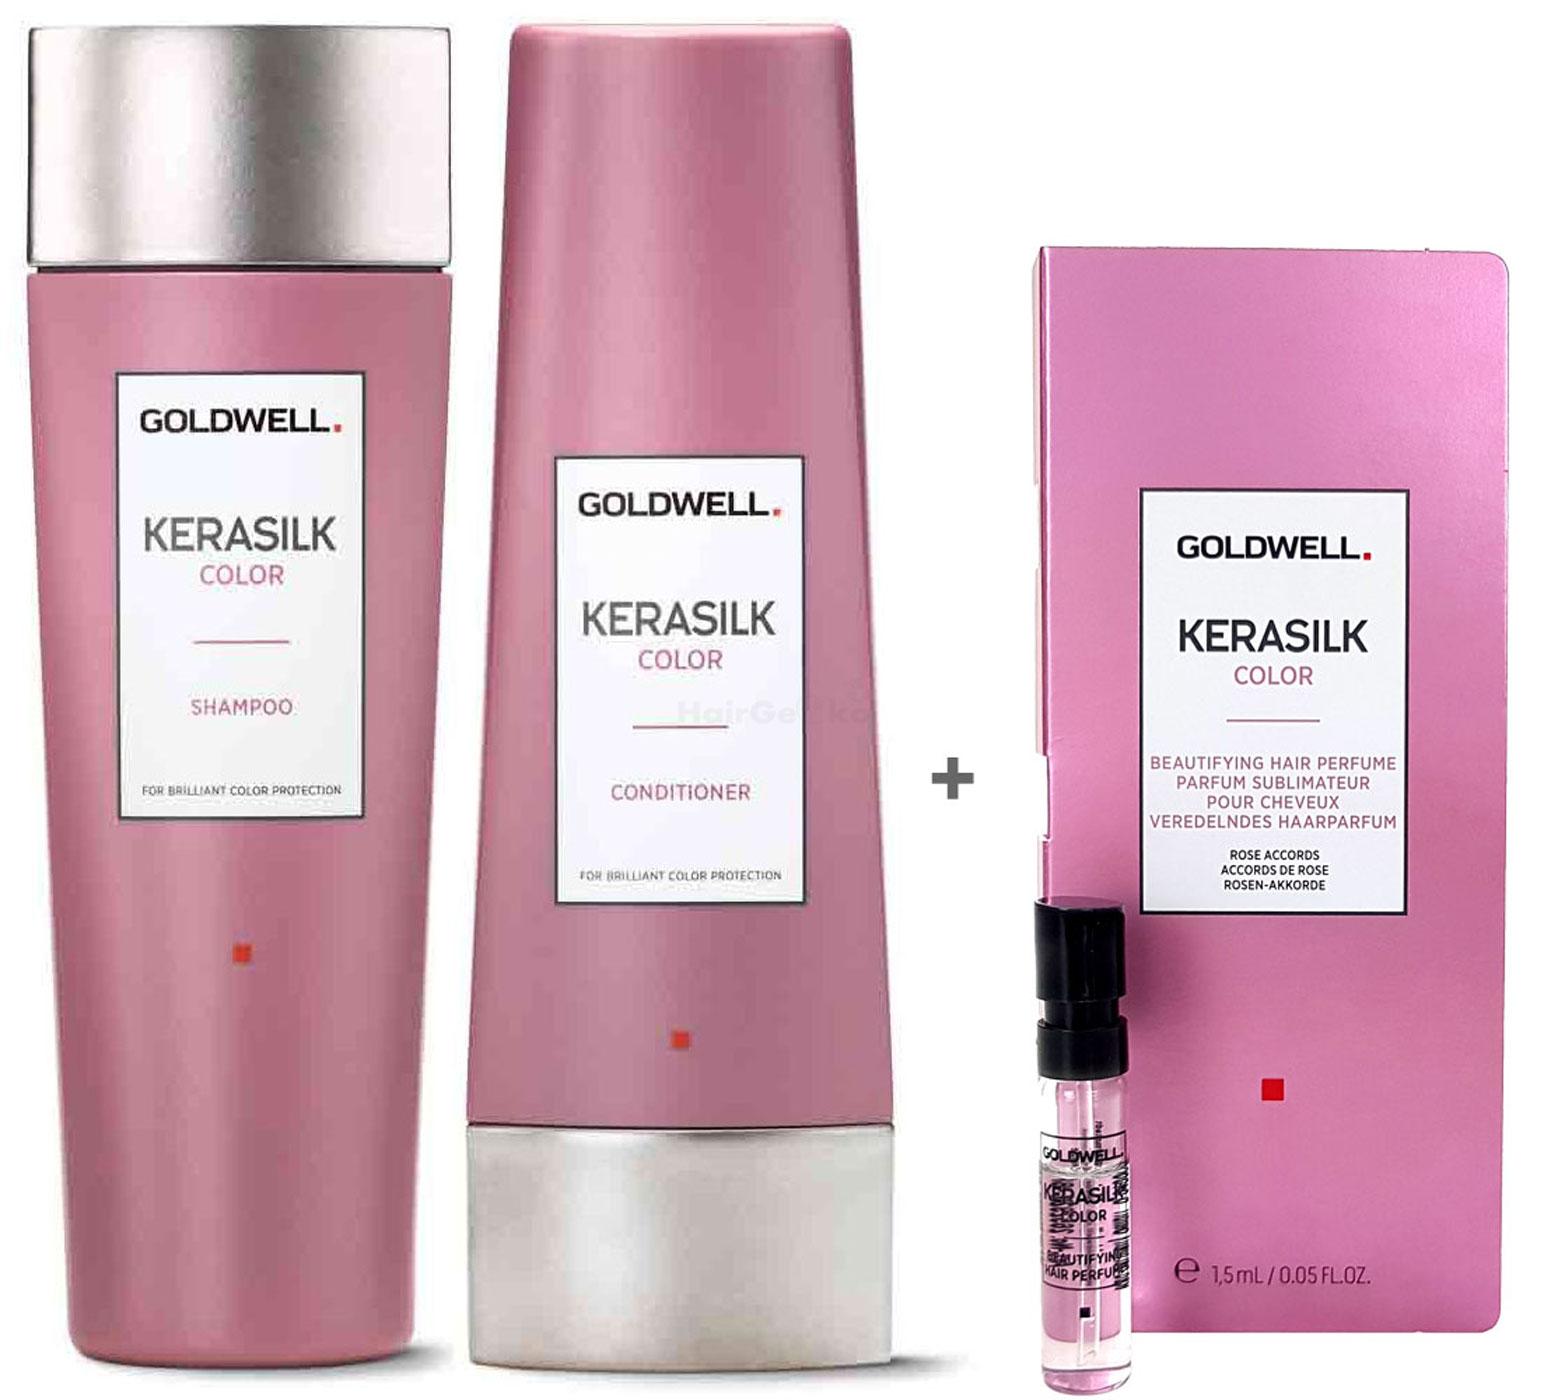 Goldwell Kerasilk Color Set - Shampoo 250ml + Conditioner 200ml + Haarparfum Probe 1,5ml